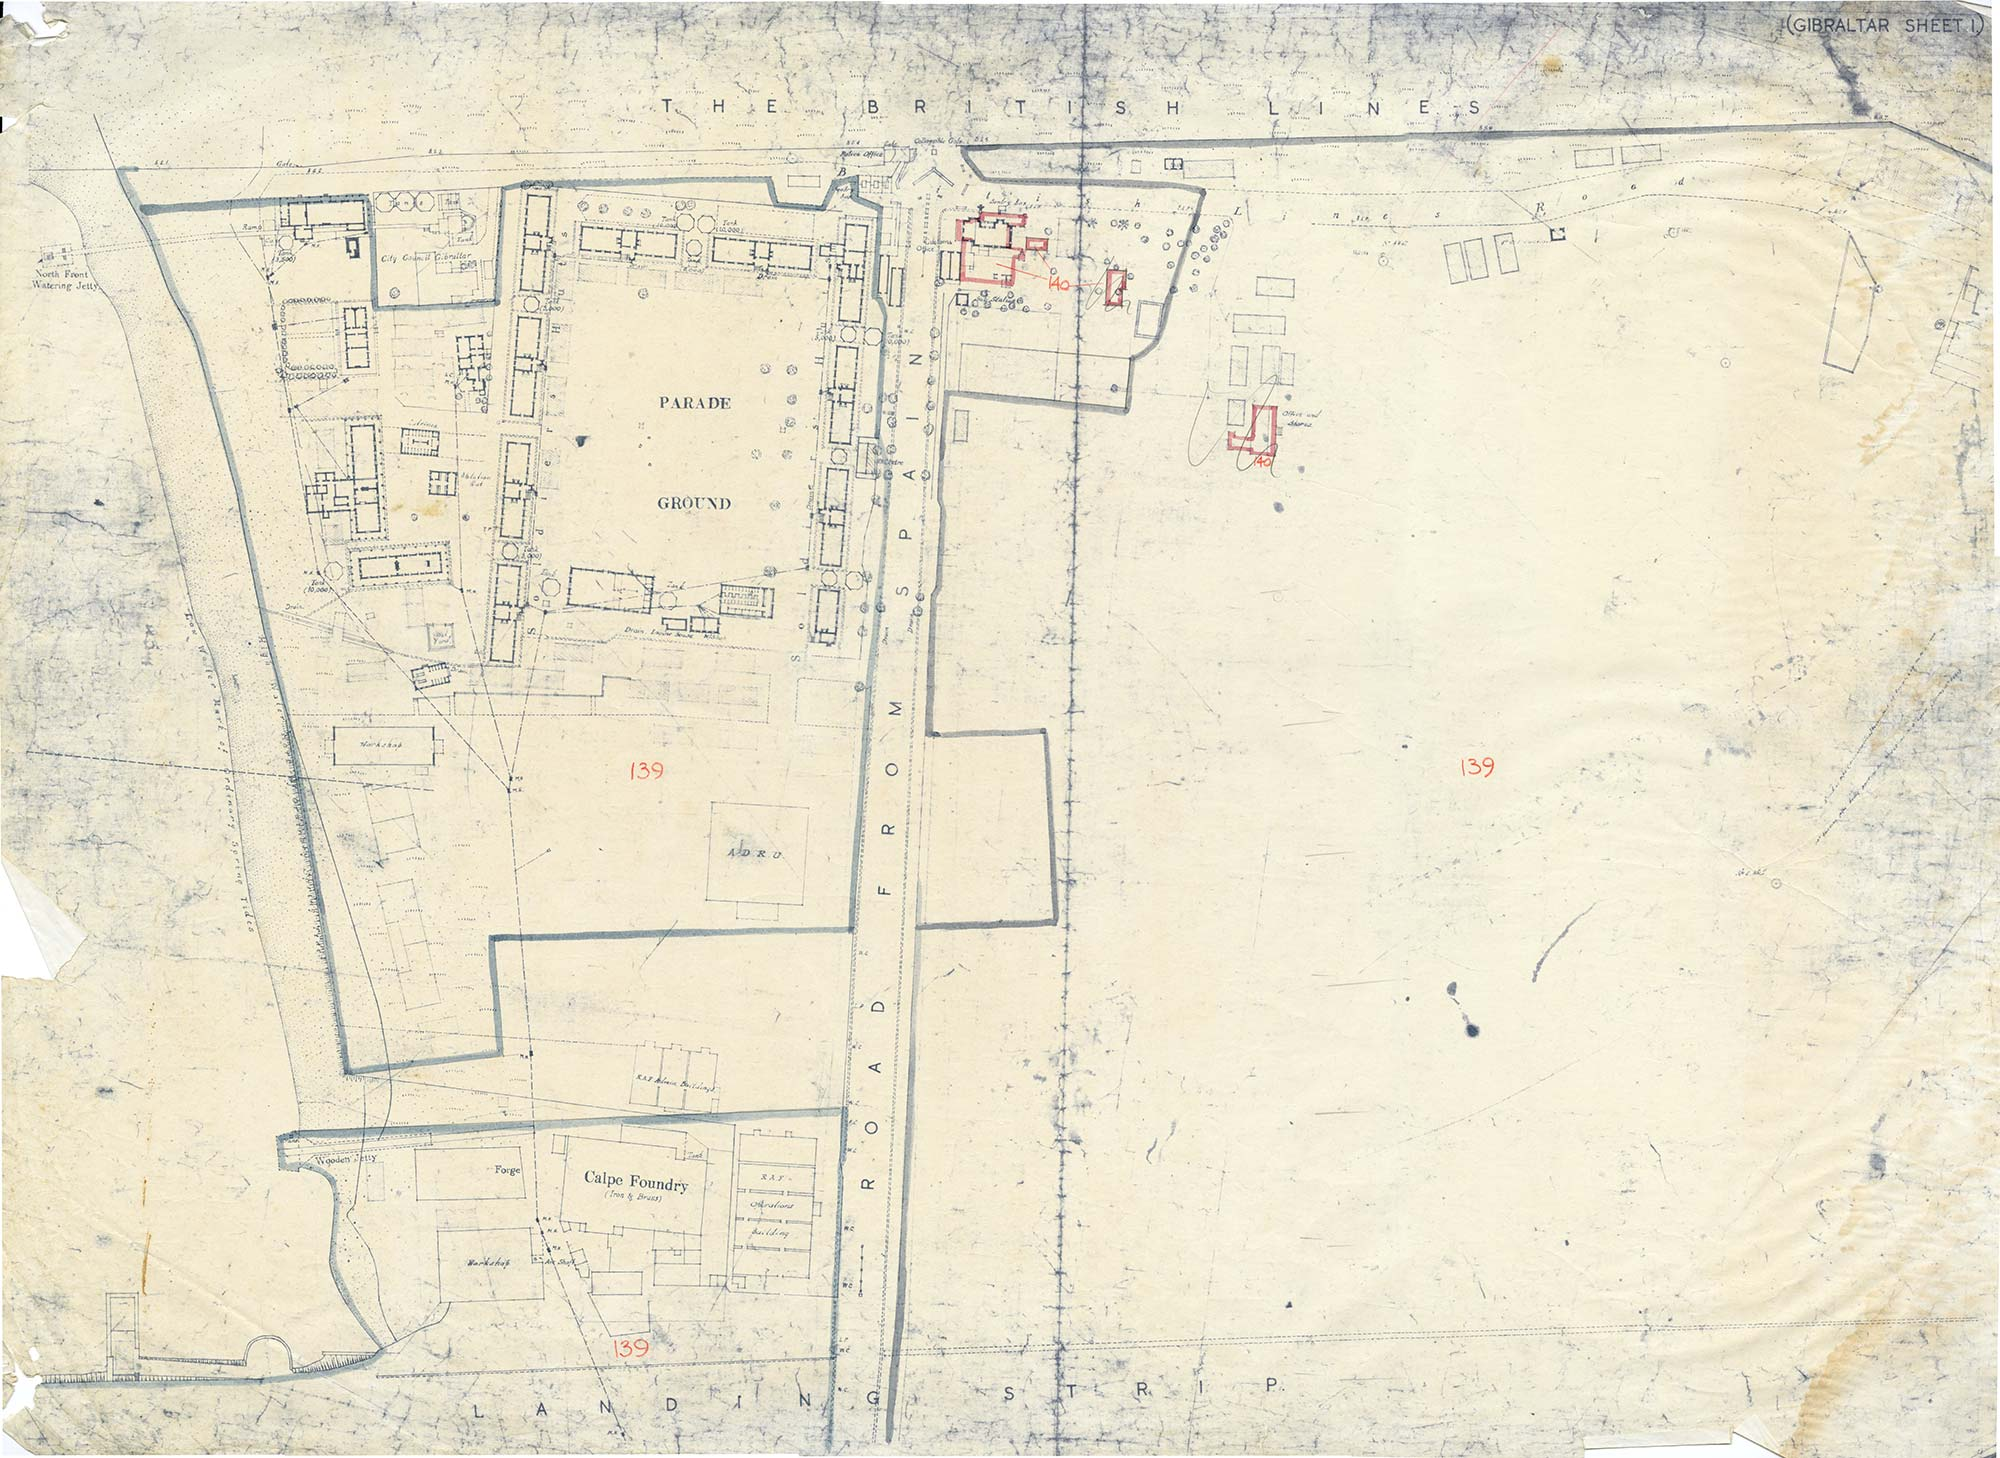 Map-15-OS-sheet-1-4-Corners-Entrance-of-Gibraltar-1944